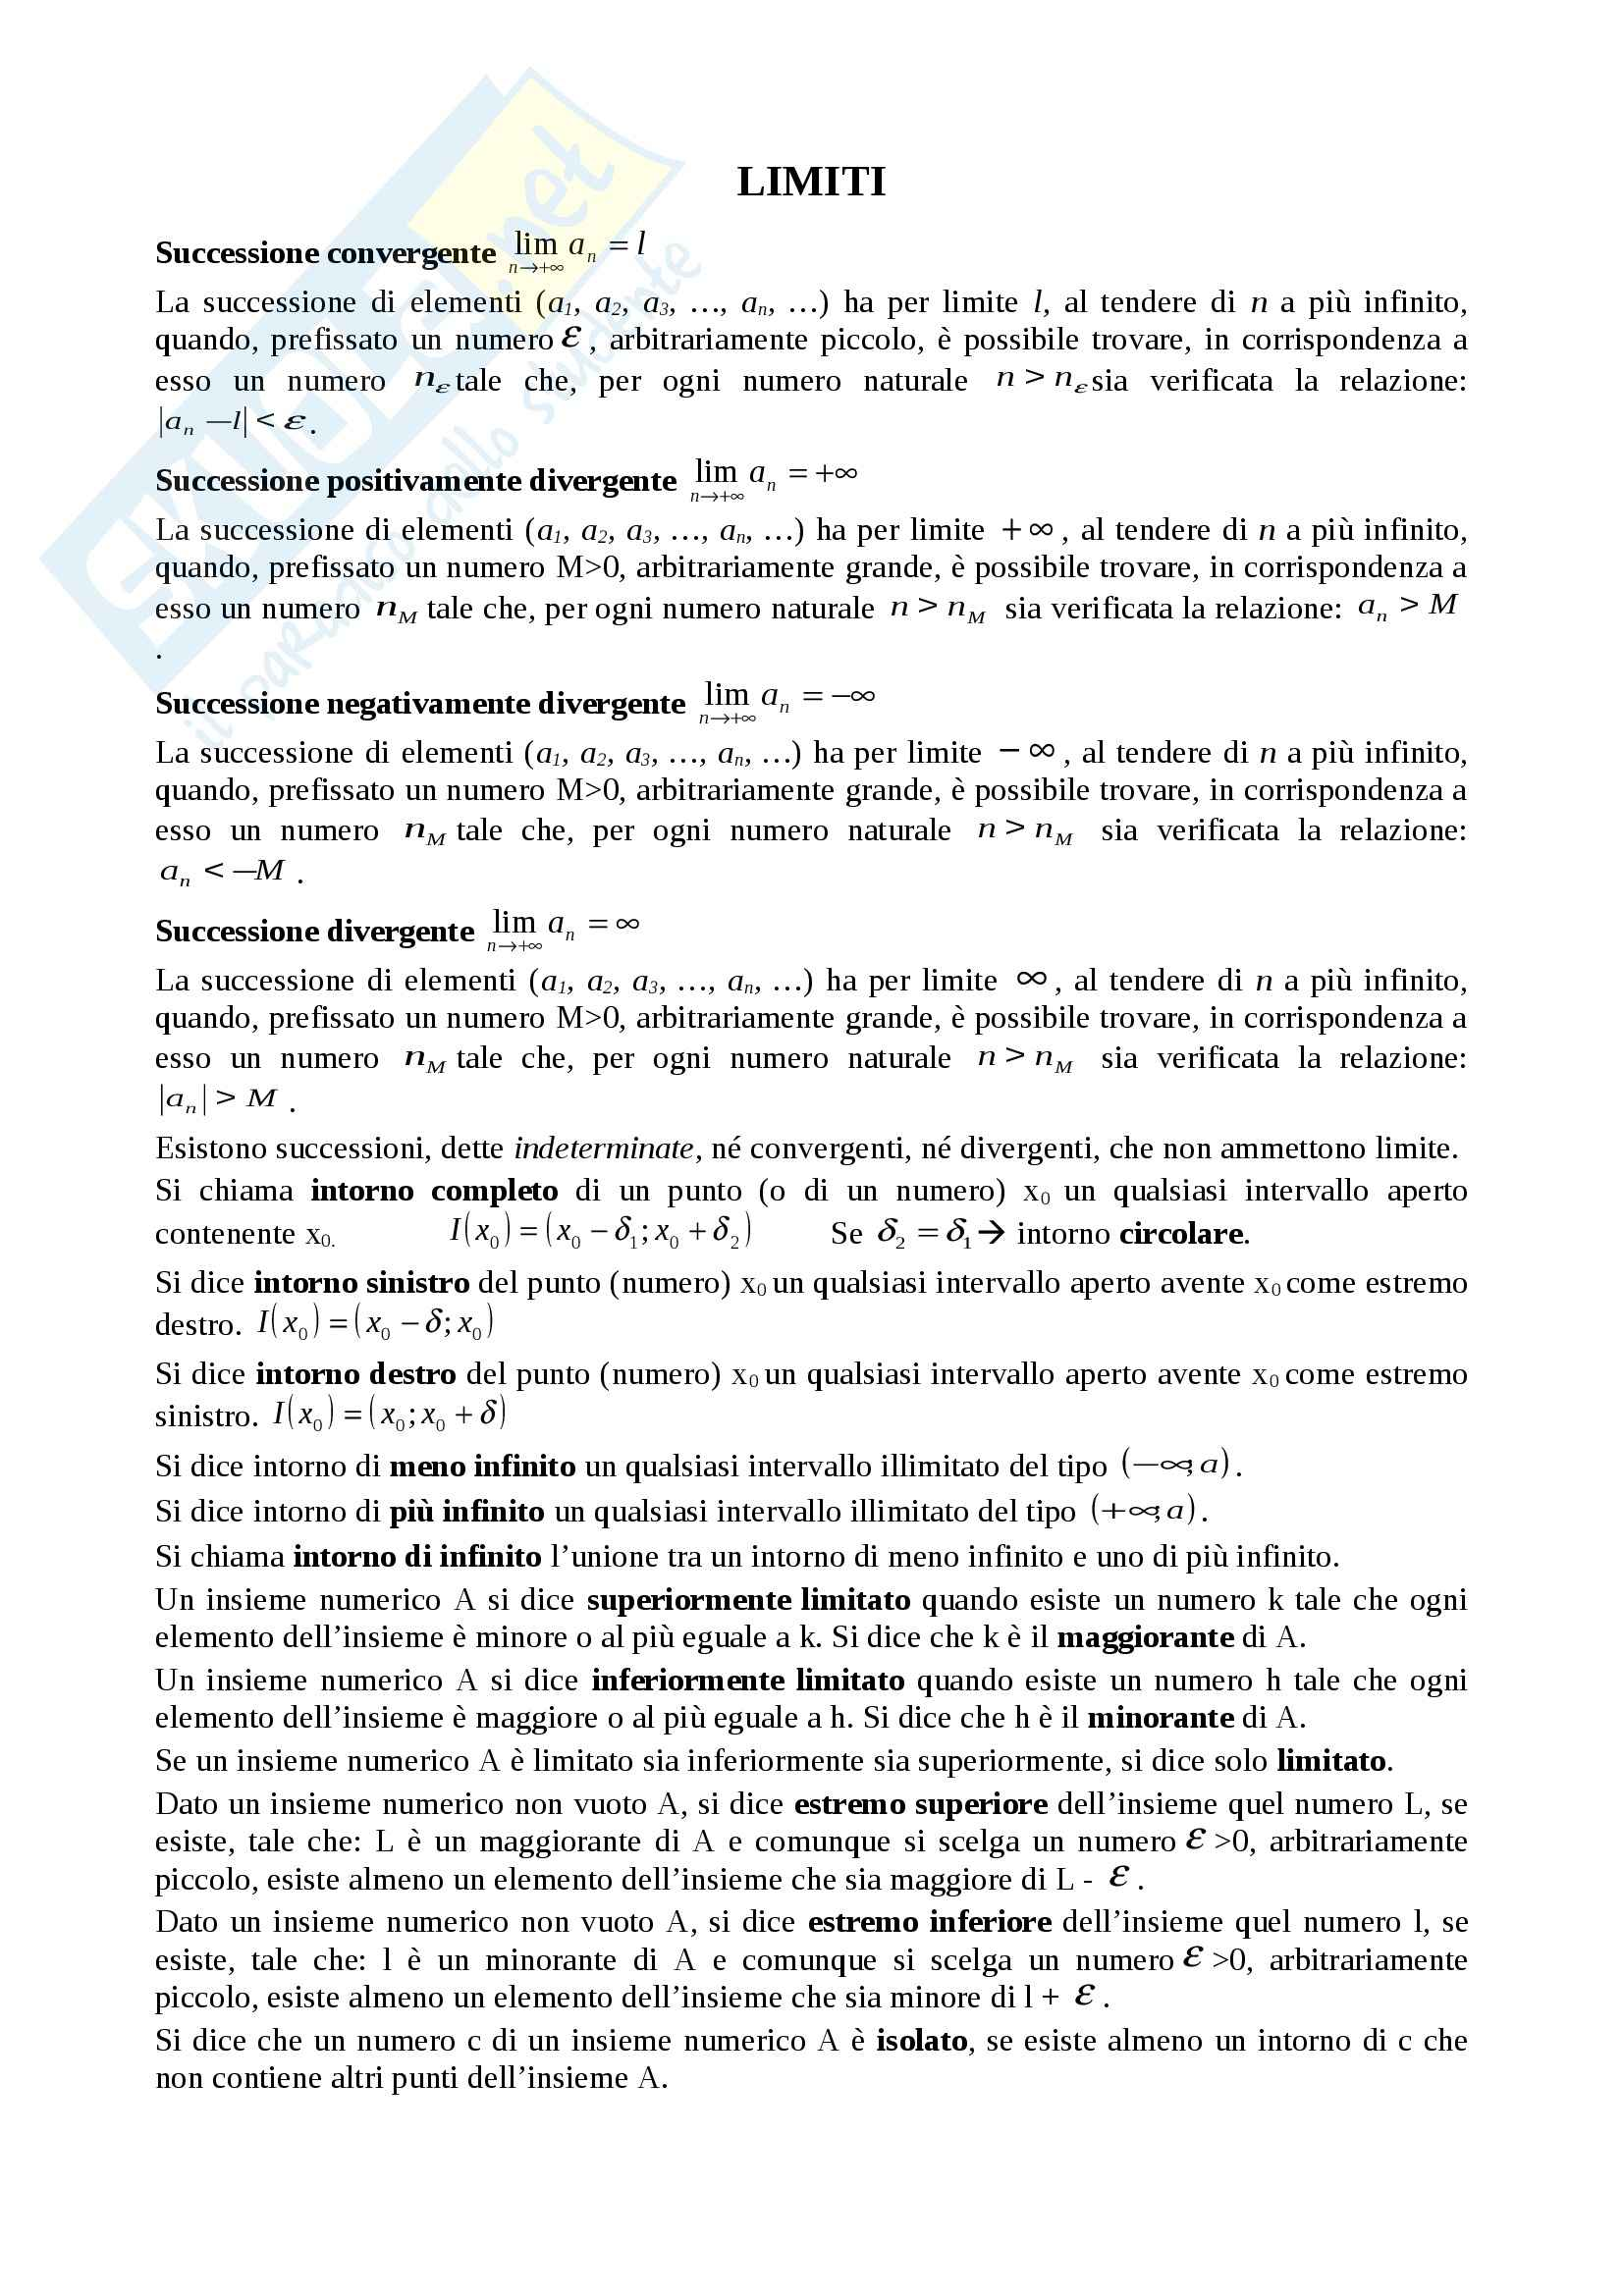 appunto C. Marcelli Analisi matematica I